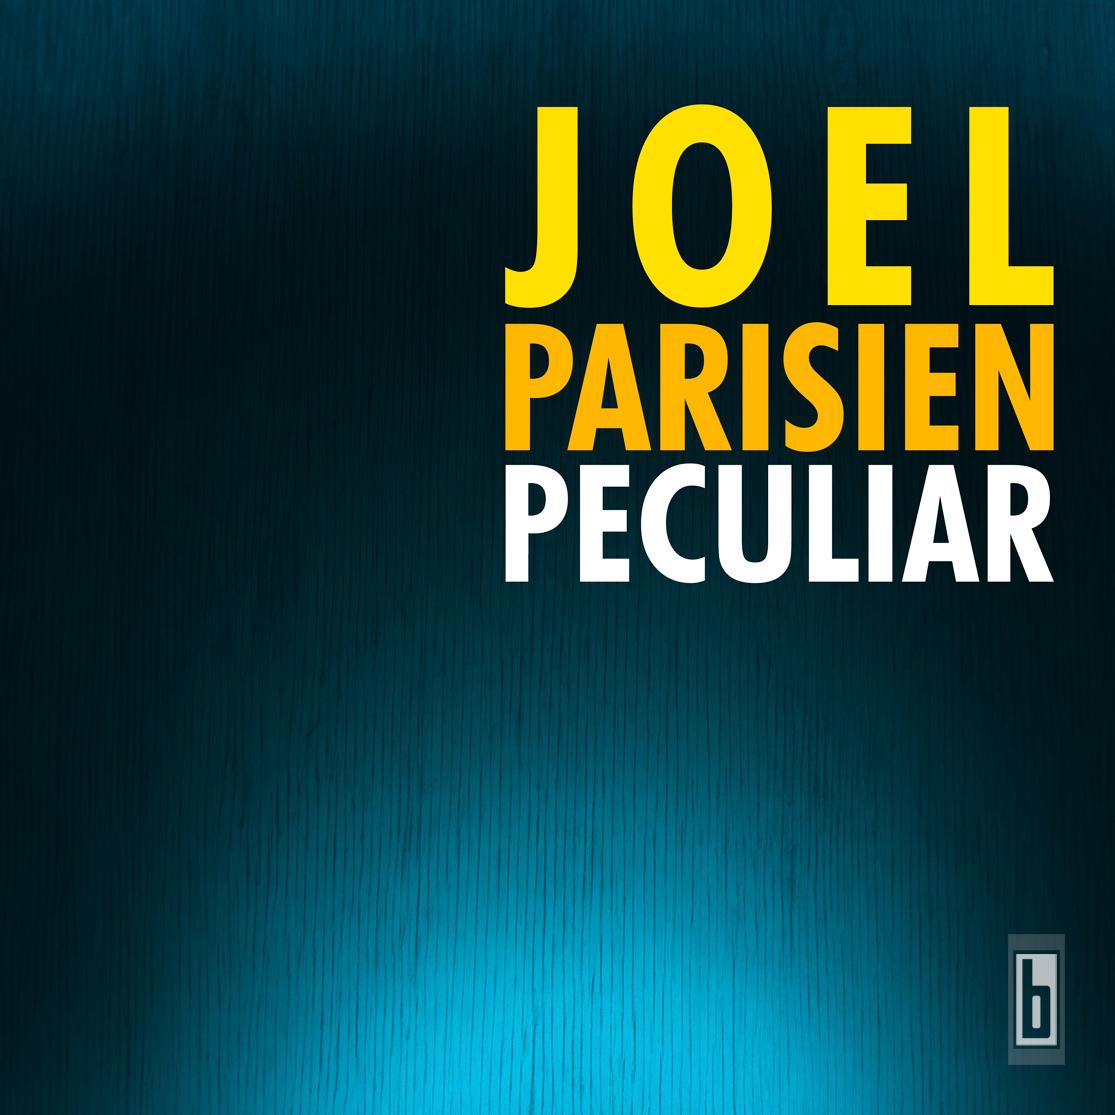 Joel Parisien Peculiar Cover 2011